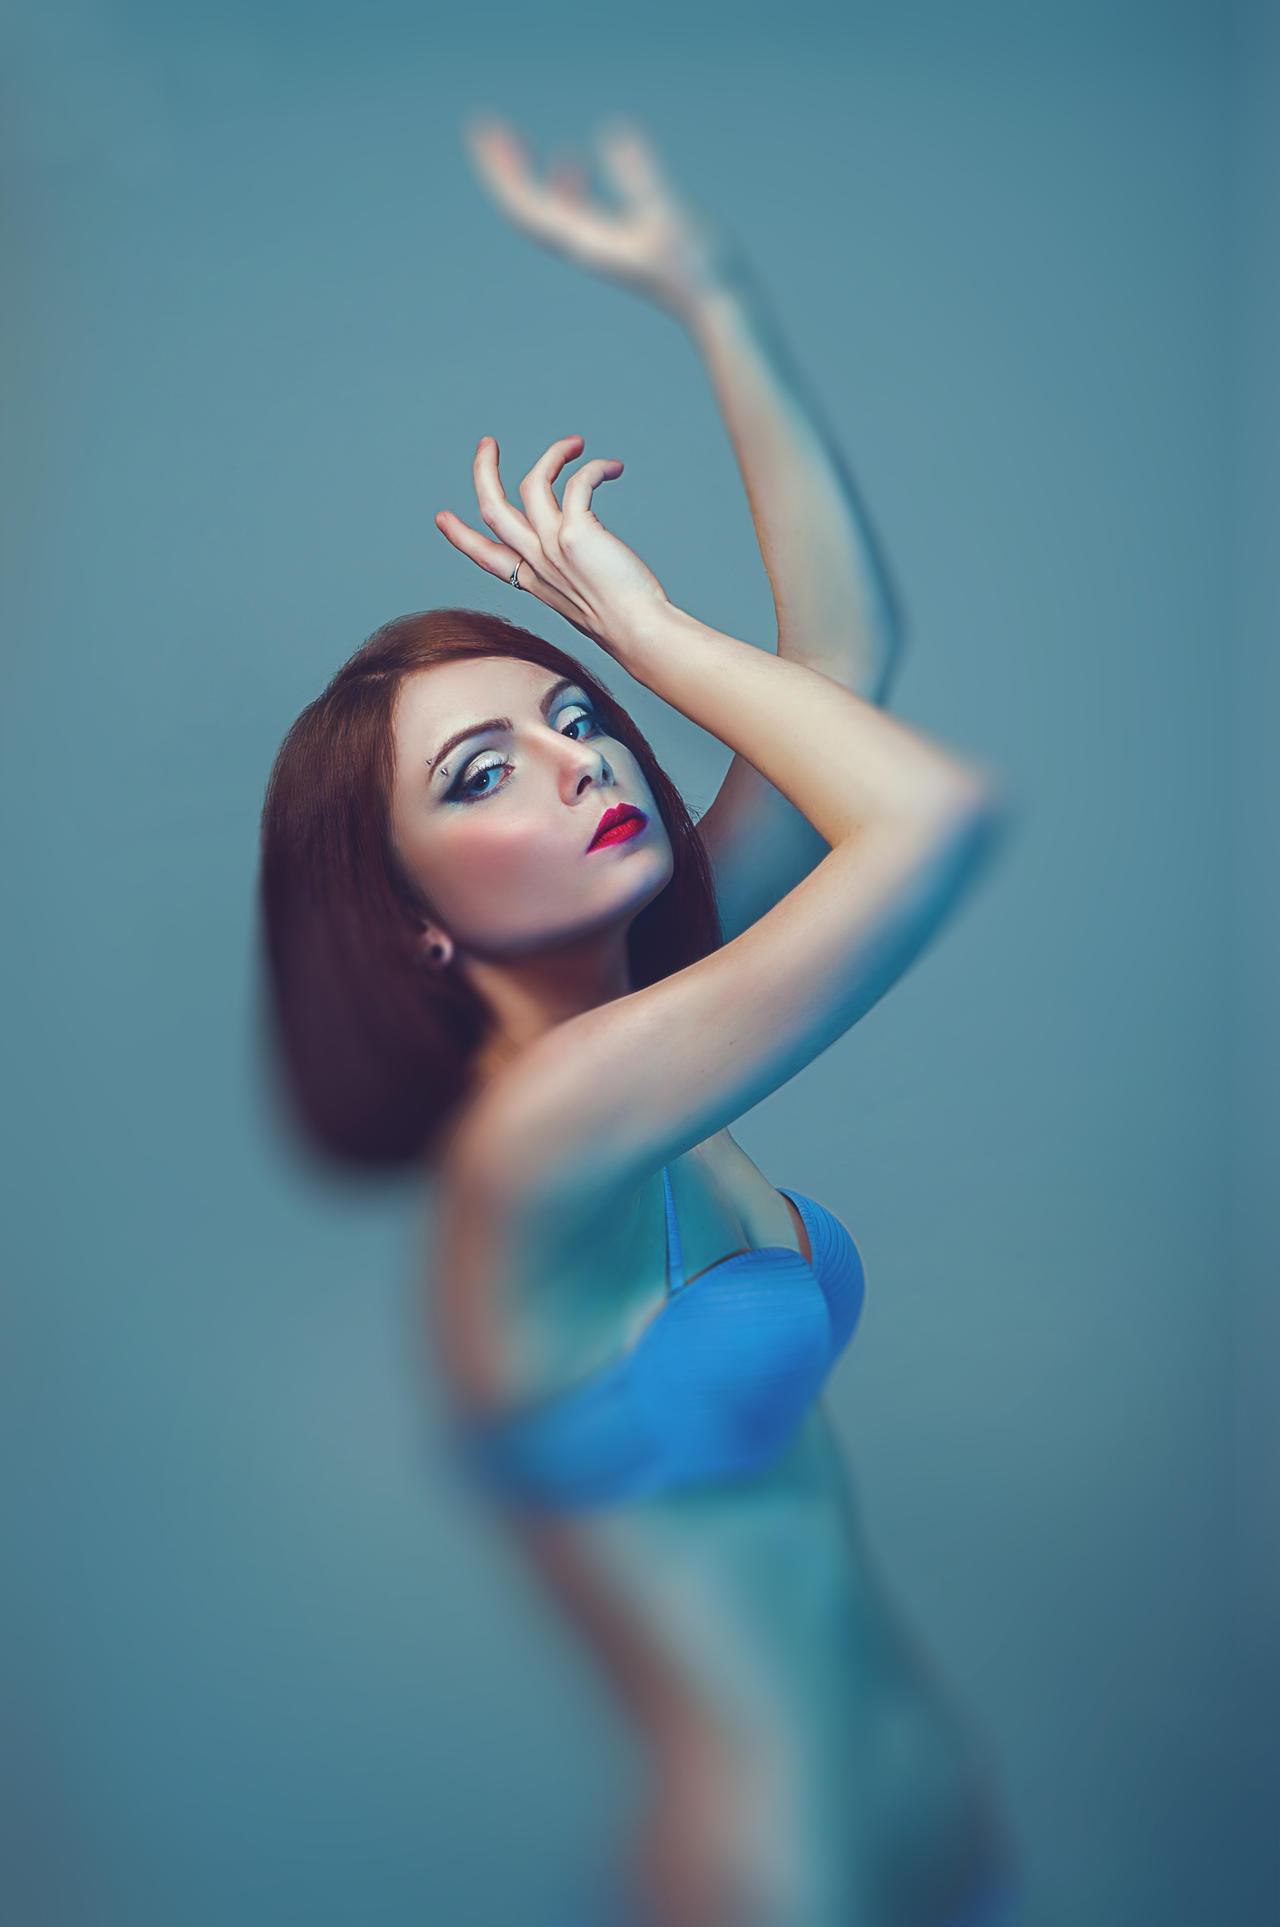 Anna by AnimA89